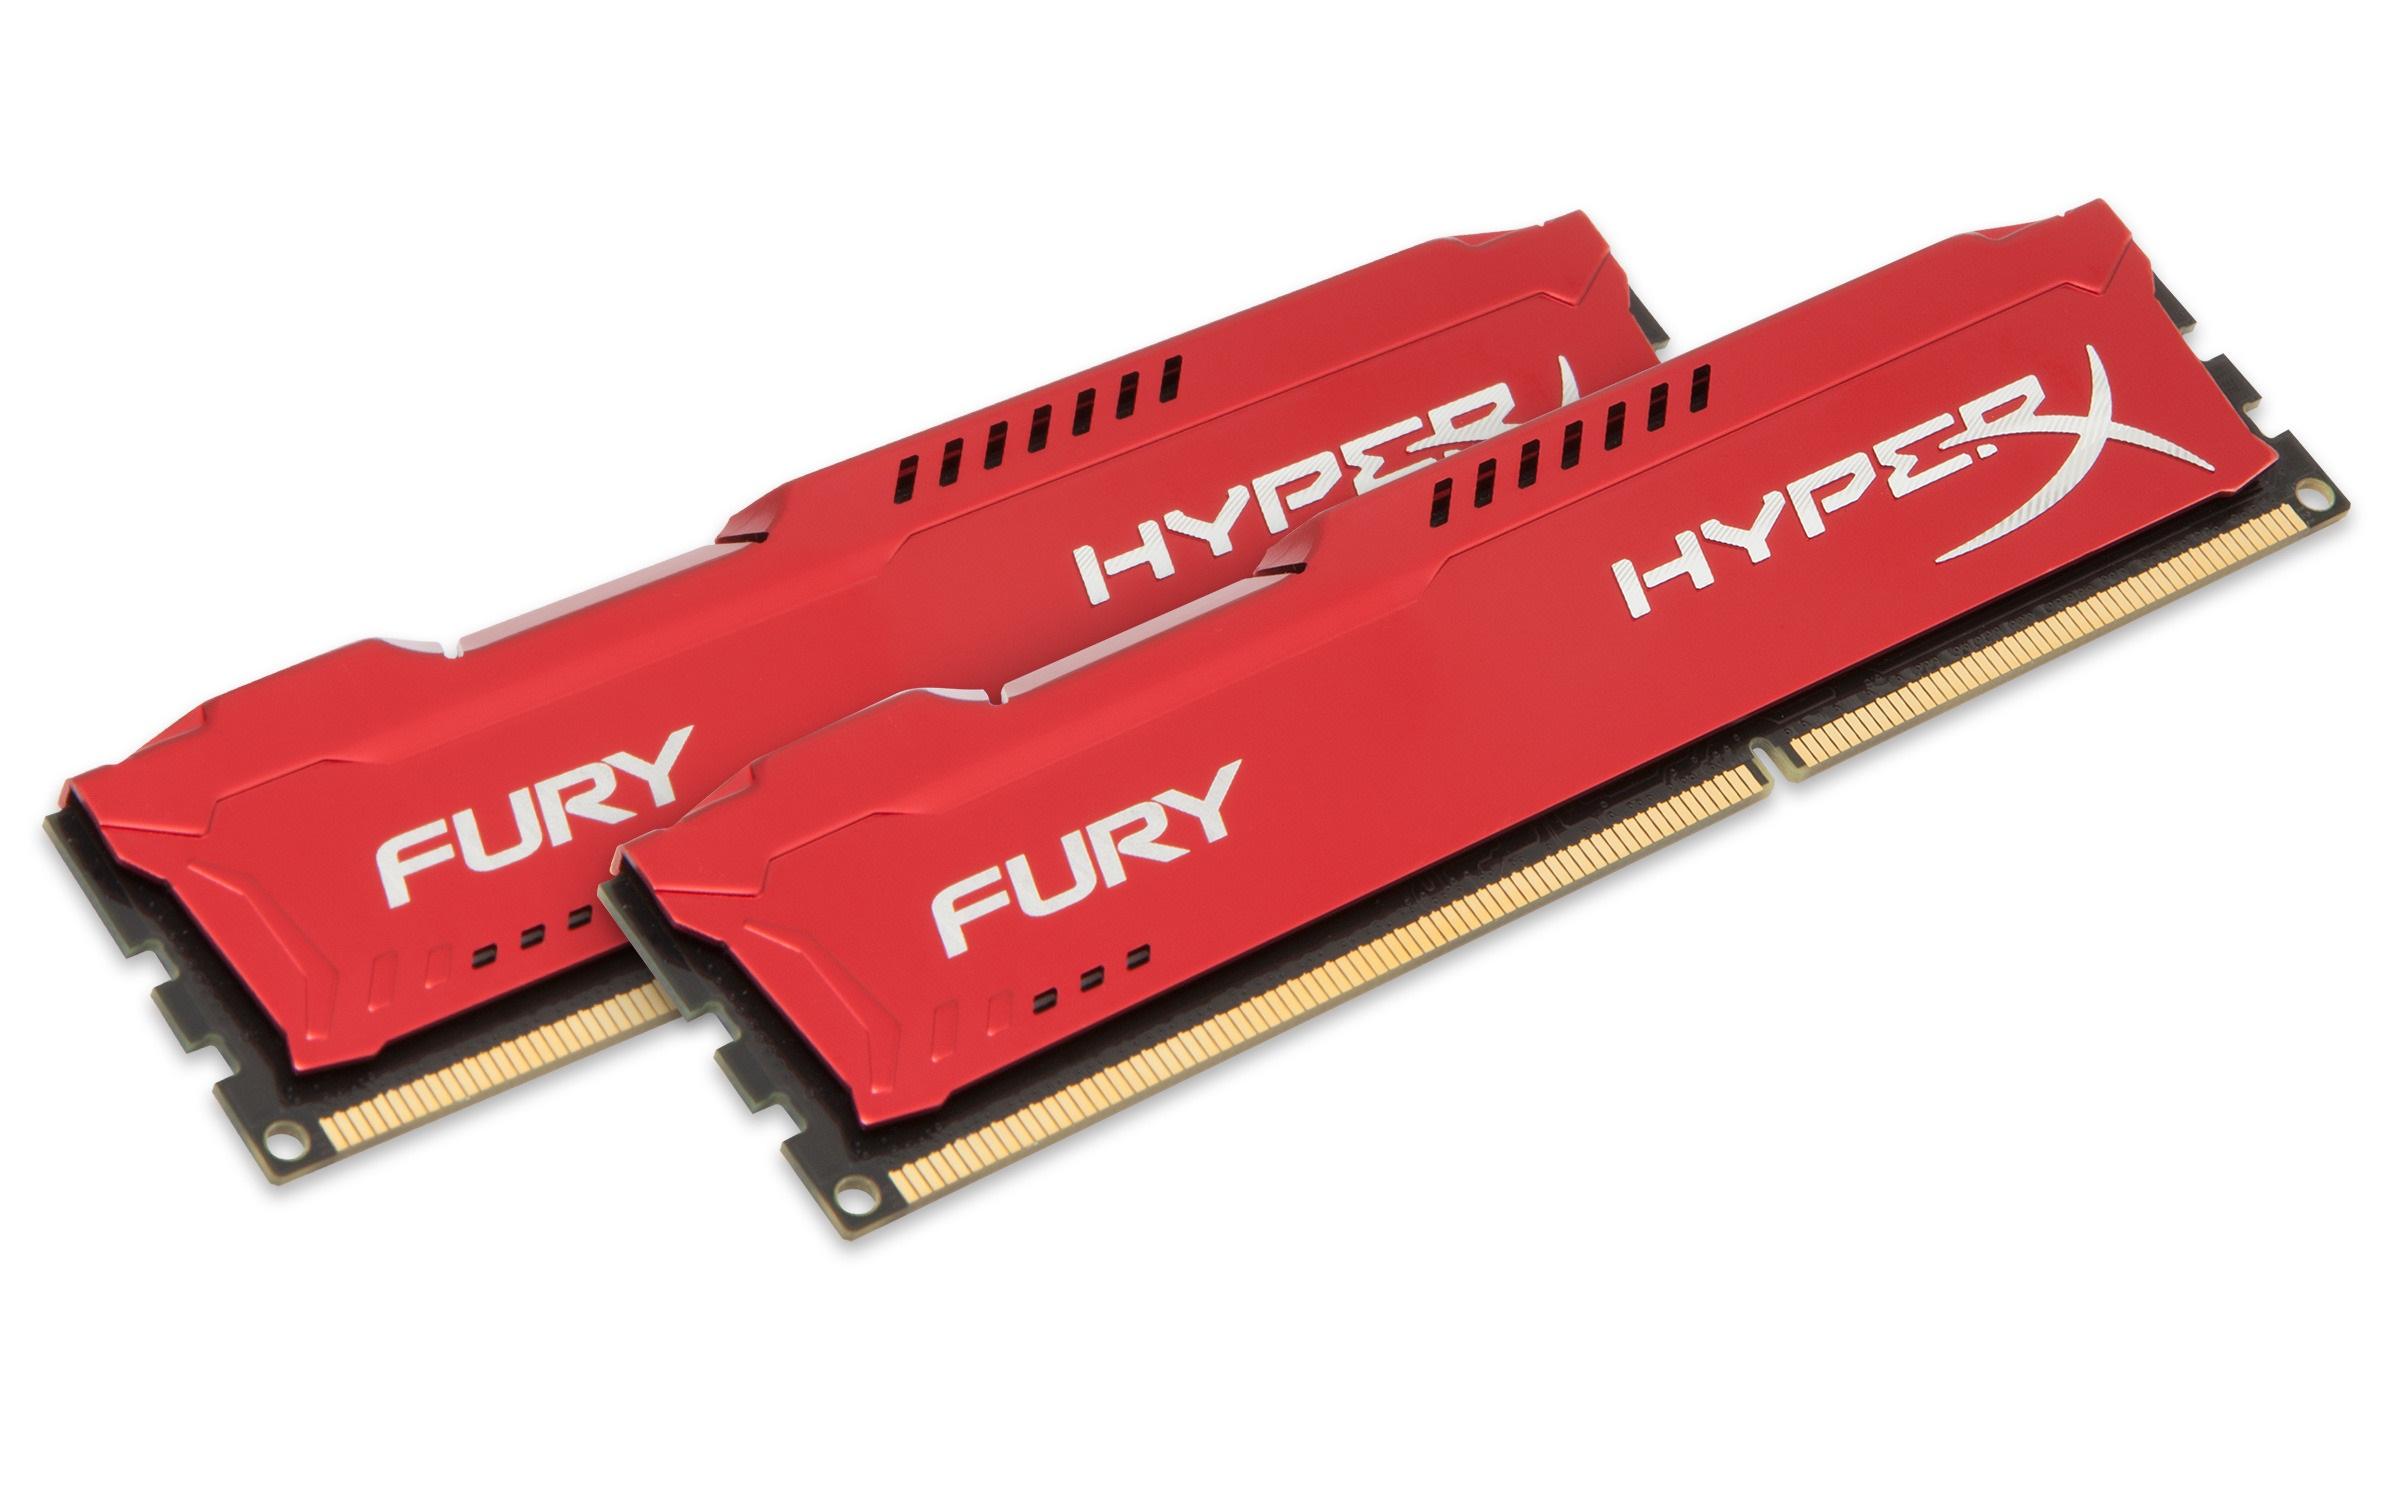 HyperX Fury 8GB (Kit 2x4GB) 1600MHz DDR3 CL10 DIMM, červený chladič